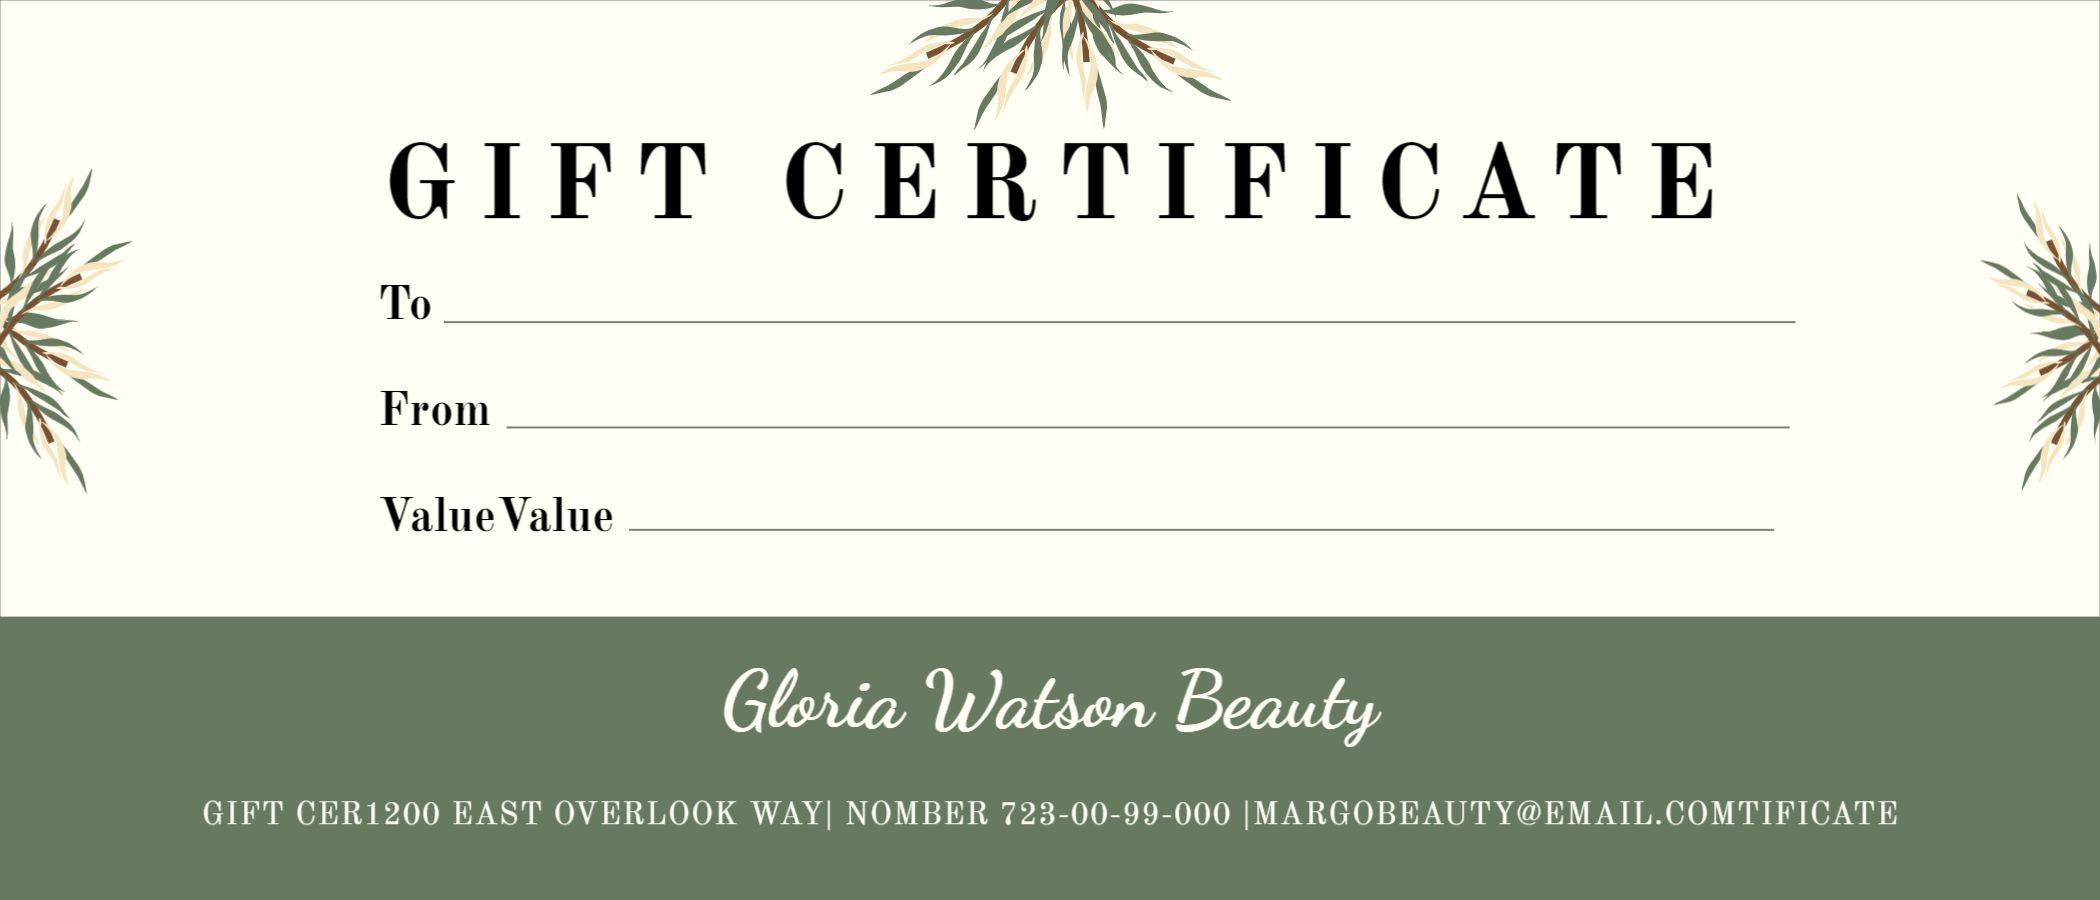 Design Gift Certificate Template